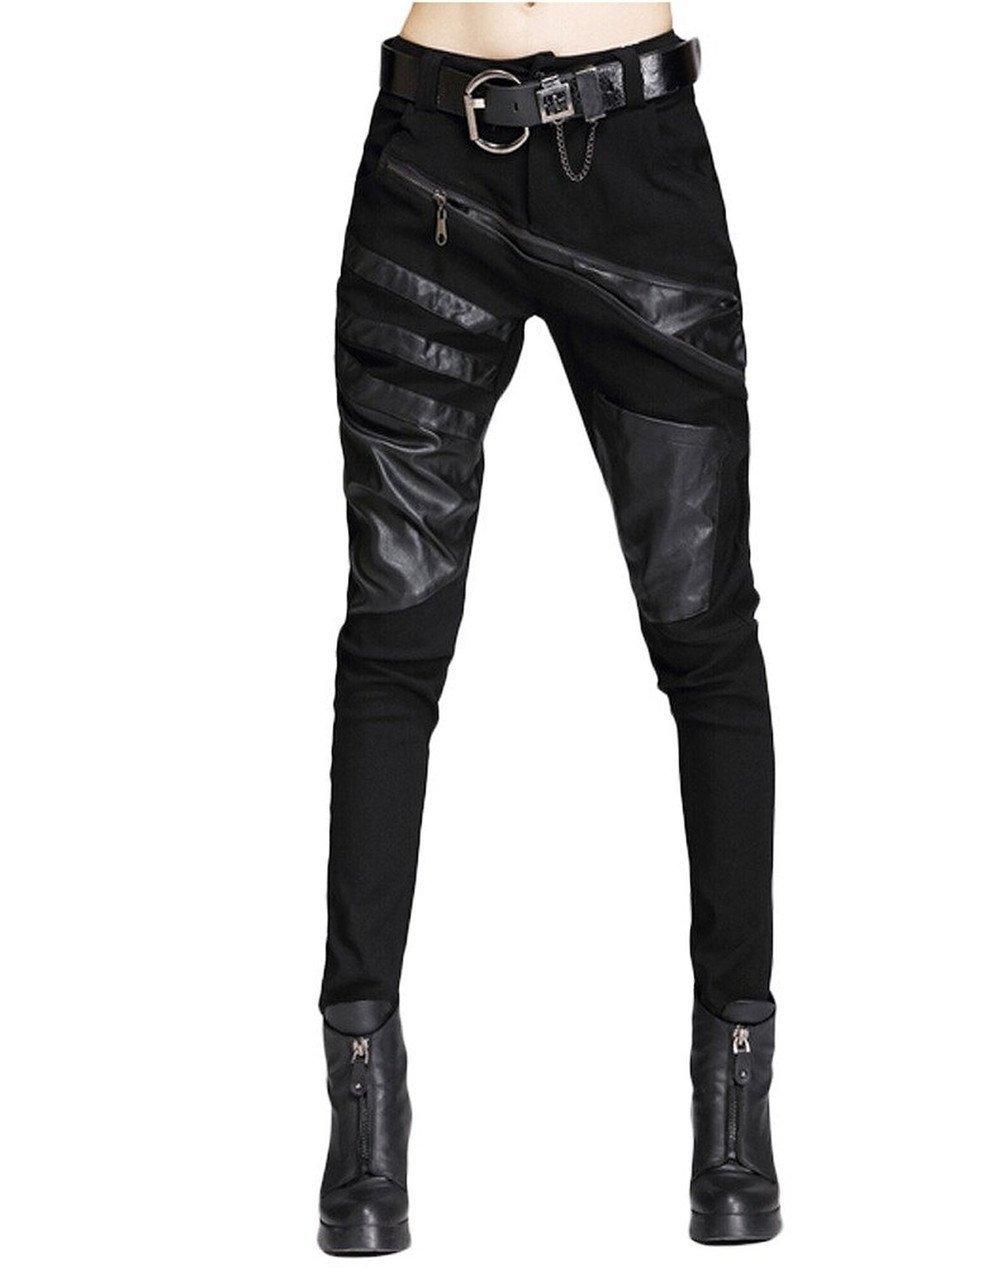 Crazy Women's Harem Patchwork Leather Pocket Punk Style Personalized Pants